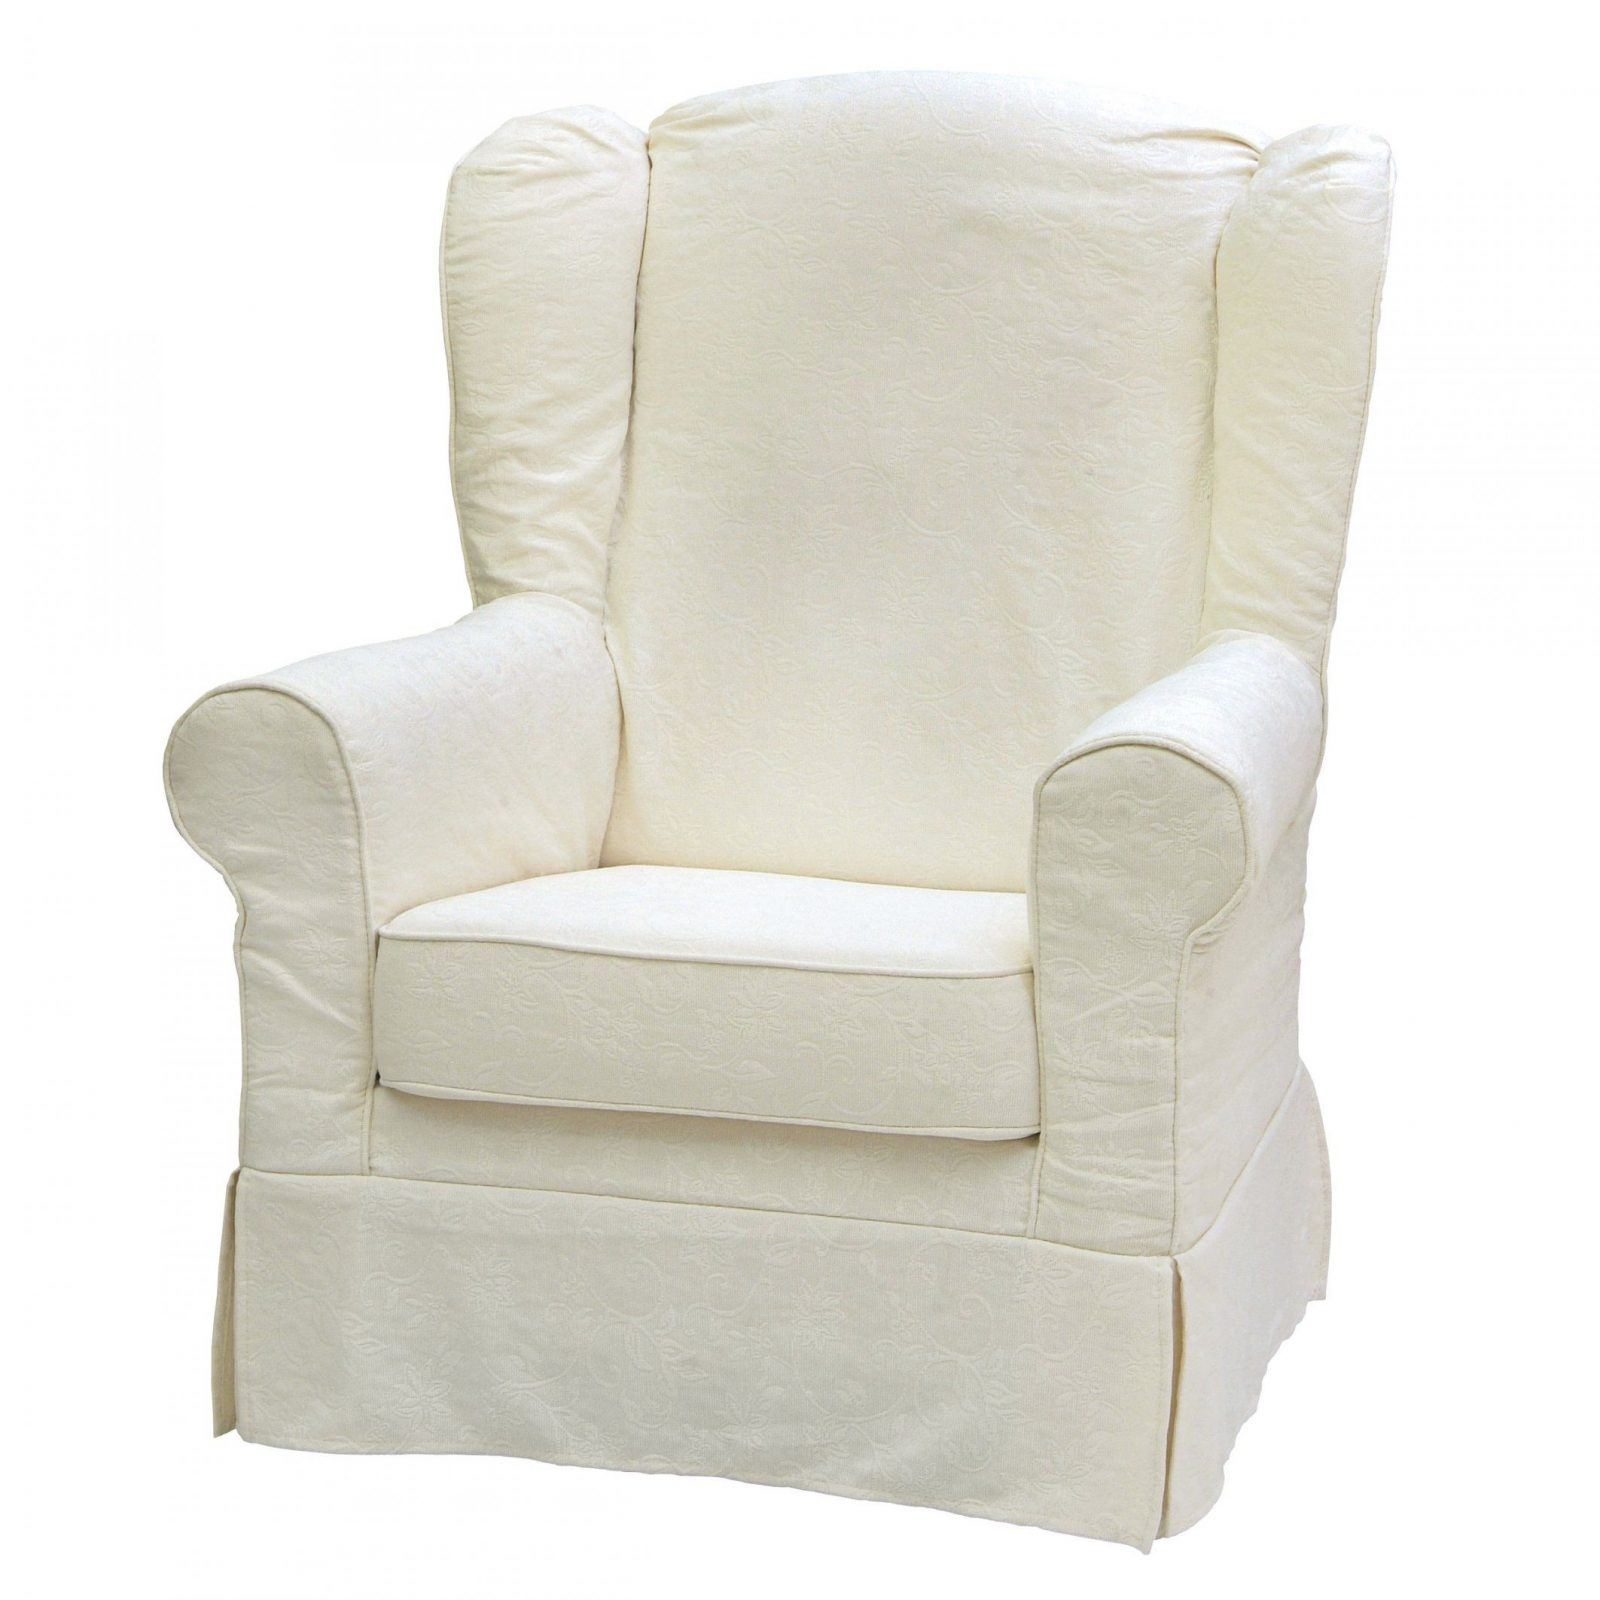 Sessel Bezug Selber Nahen Perfekt Sitzsack Sessel Selber Machen